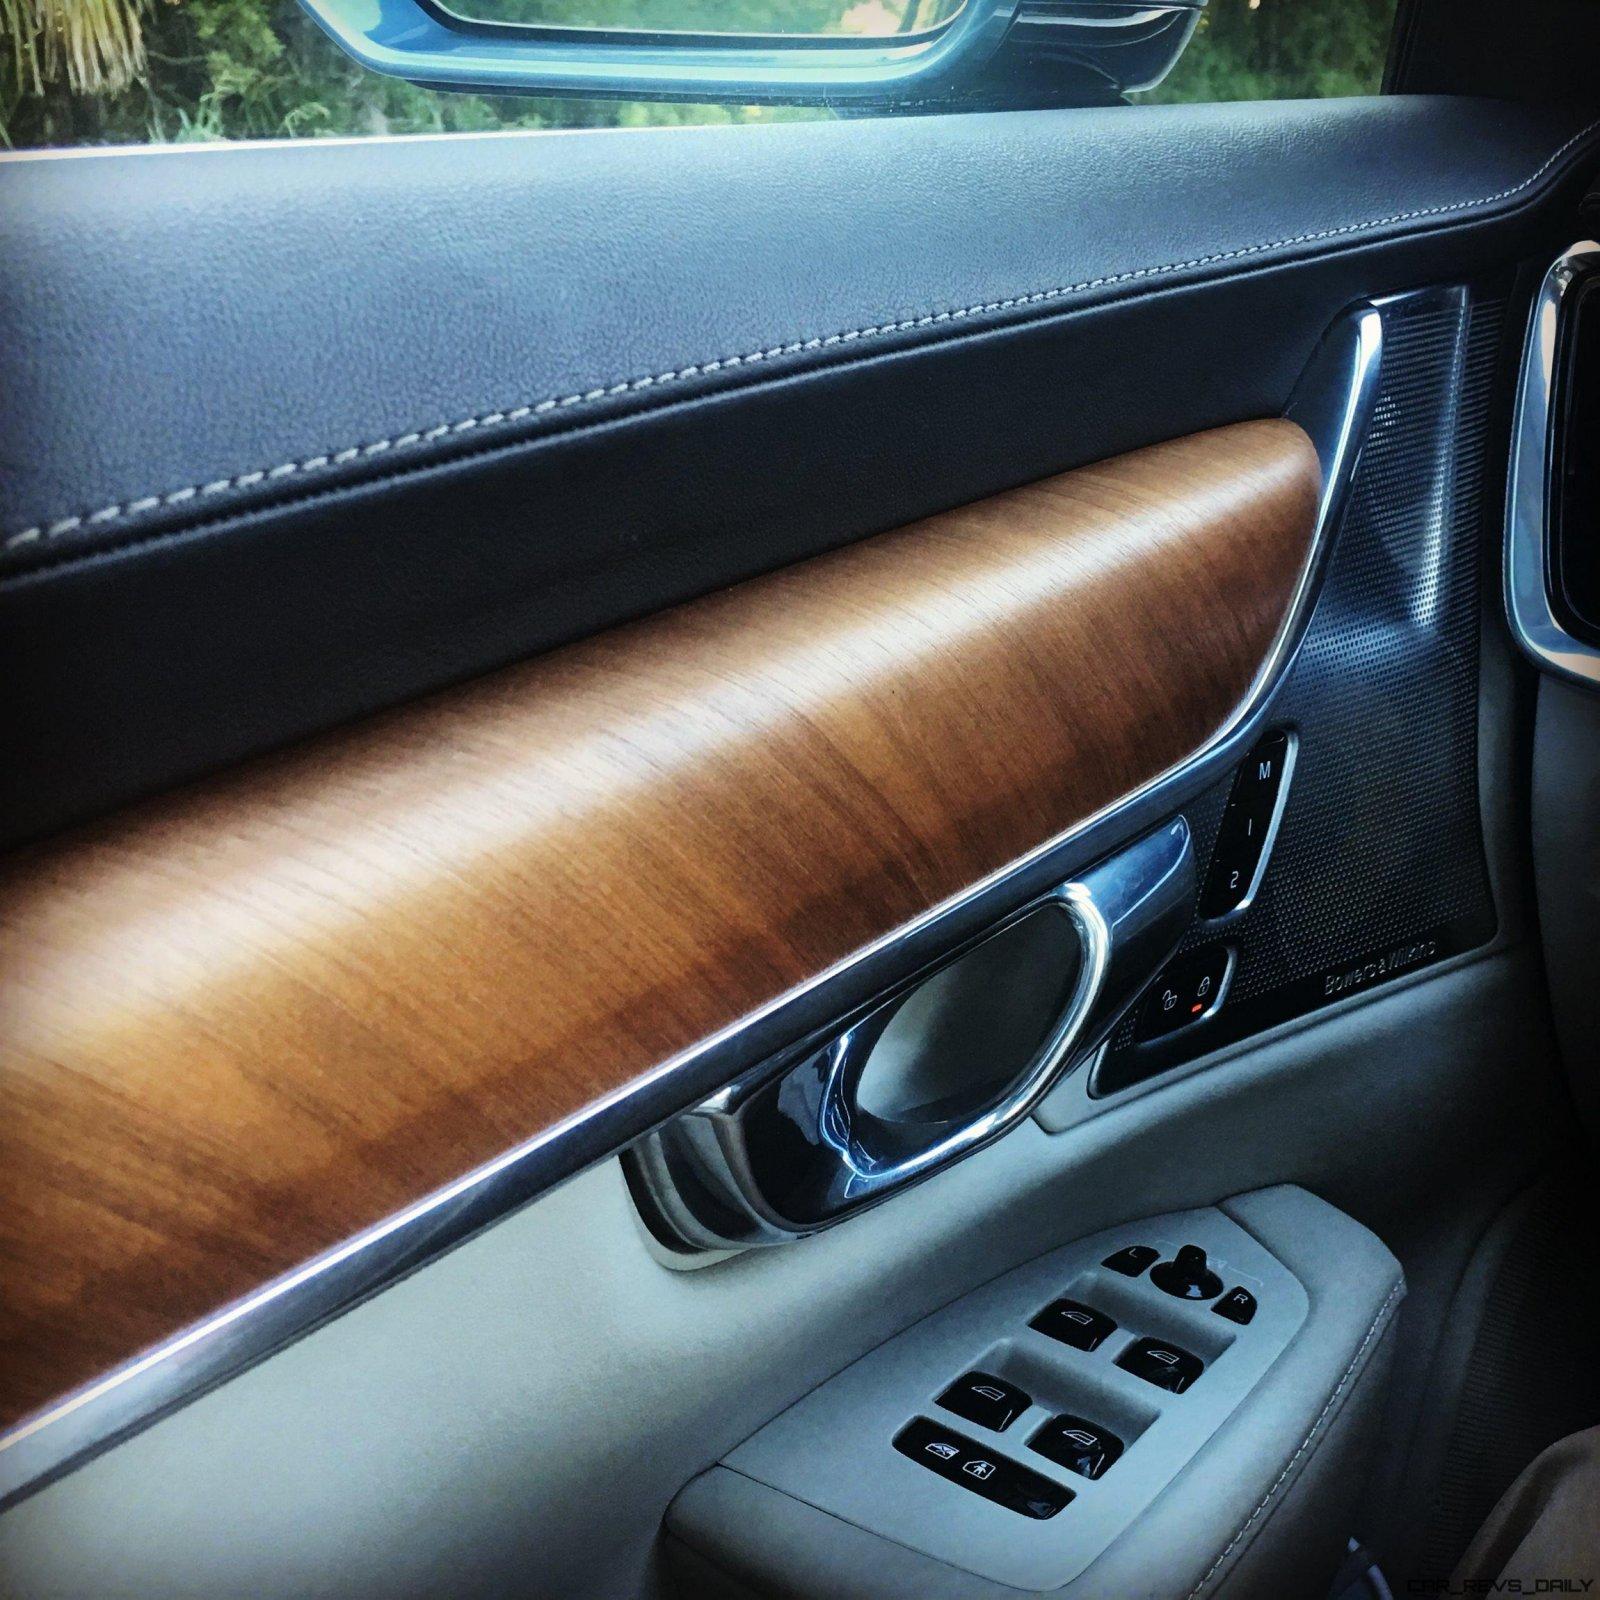 Largest Volvo Suv: VOLVO S90 T6 AWD Interiors 21